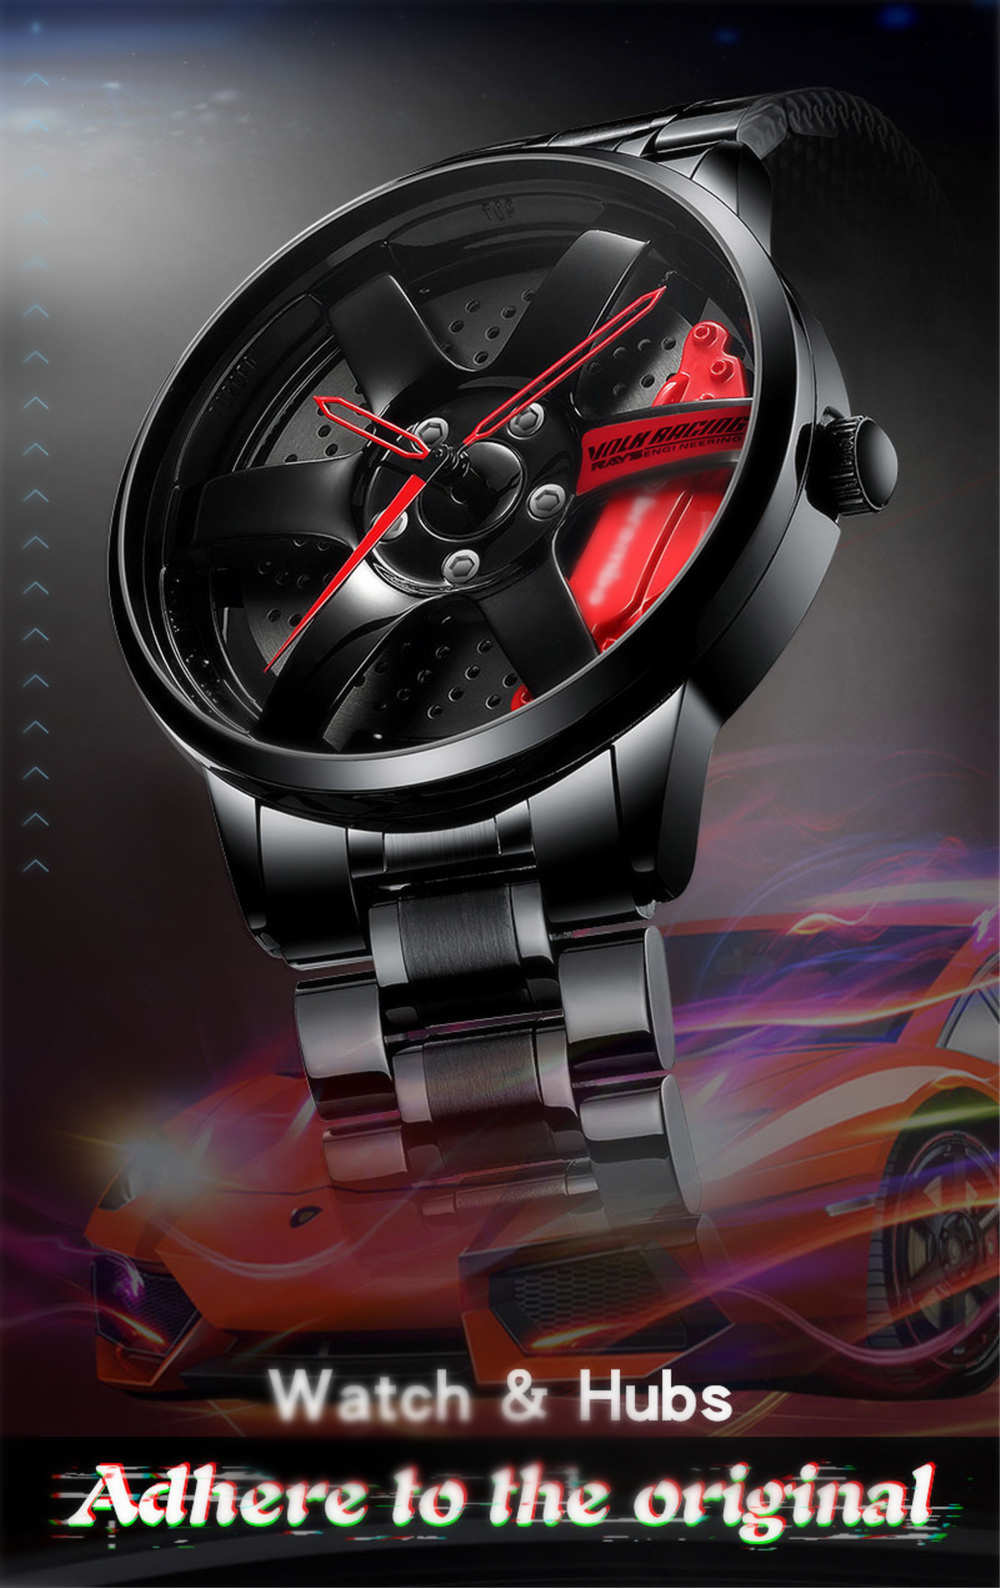 Hfbfcf442c86a4142b13723be4f35805c4 2020 NIBOSI Wheel Rim Design Sport  Waterproof